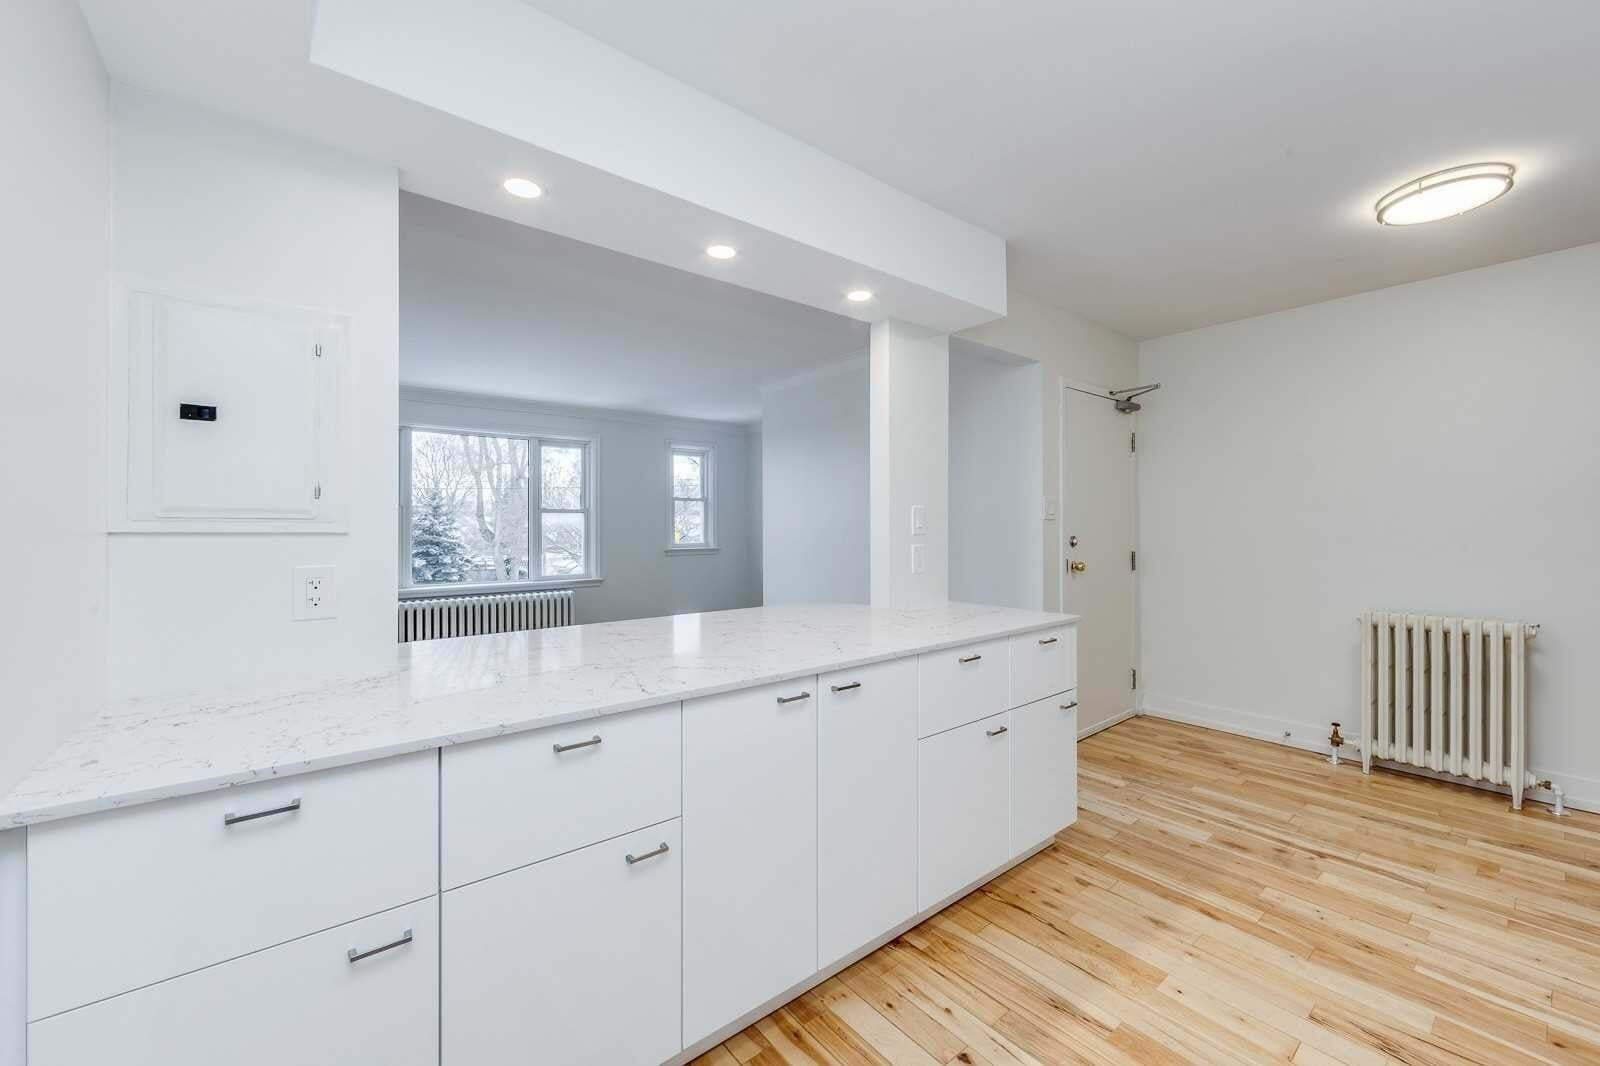 Buliding: 1089 Broadview Avenue, Toronto, ON